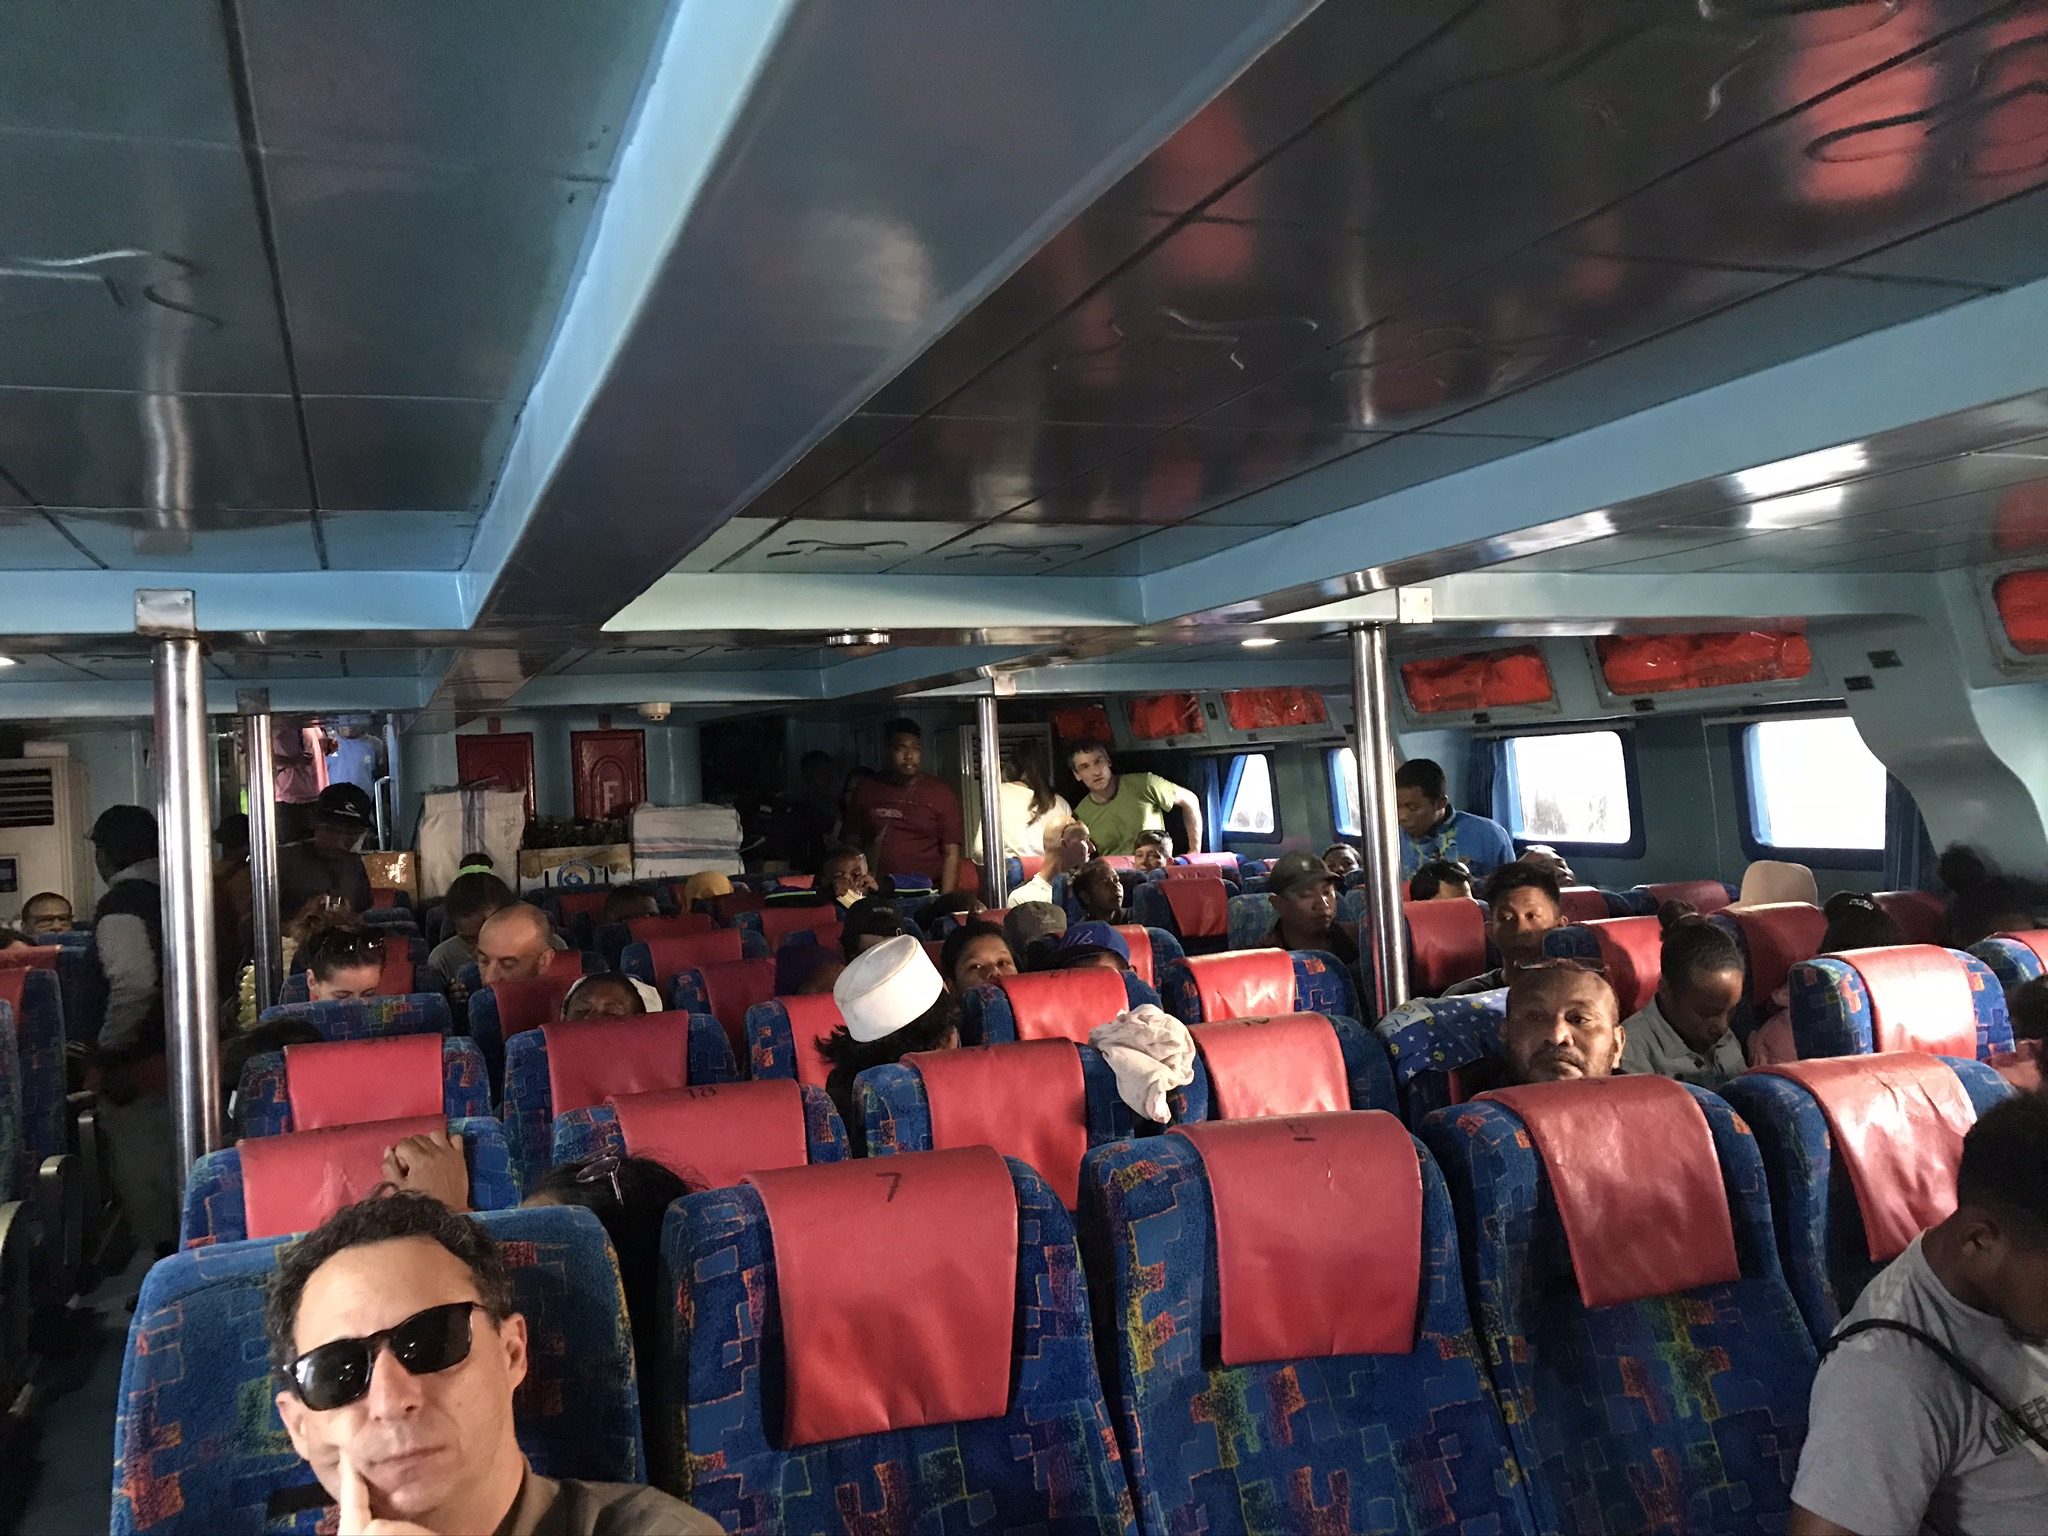 Sorong to Waisai Ferry, economy seating